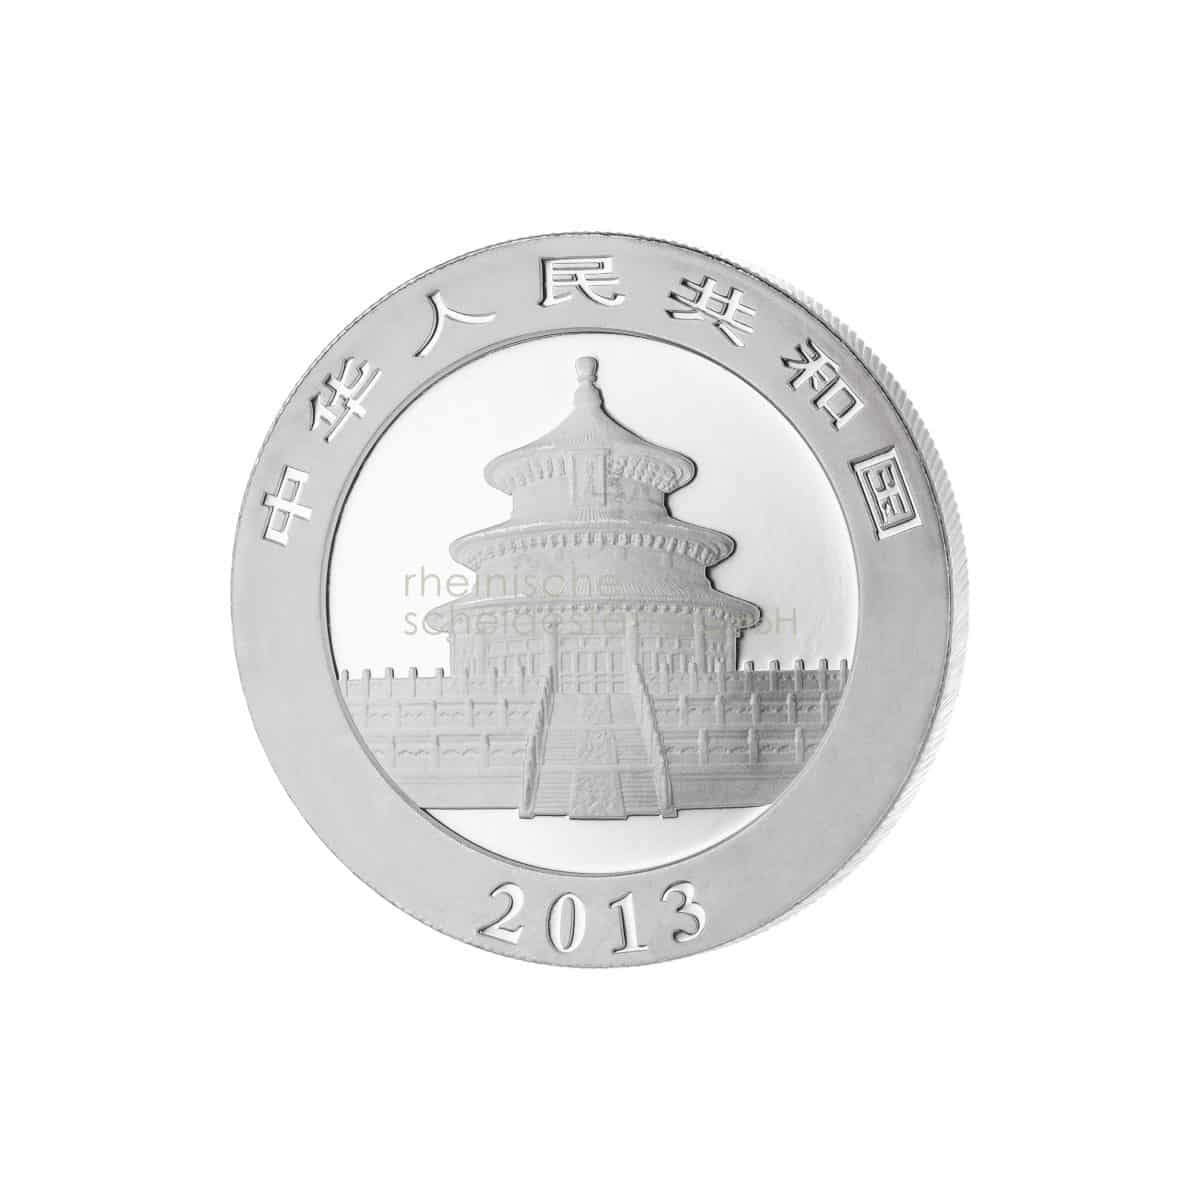 China Panda Silber Silbermünzen Rückseite